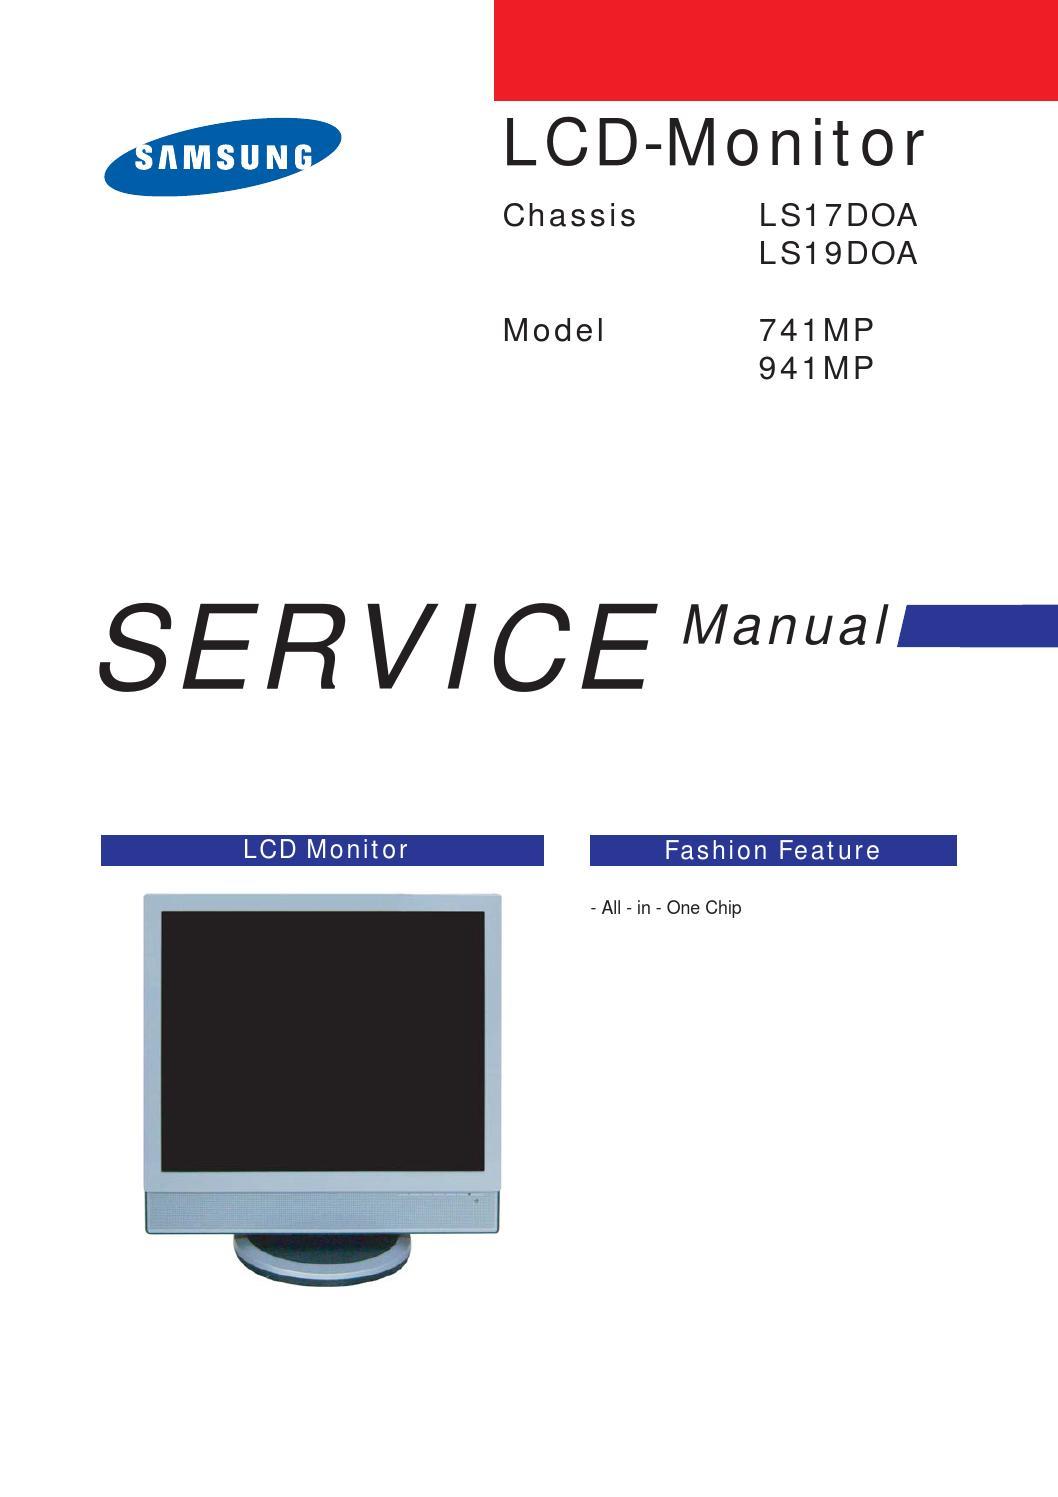 Manual De Servi U00e7o Monitores Samsung Modelos 941mp E 741mp Chassis Ls19doa E Ls17doa  By Portal